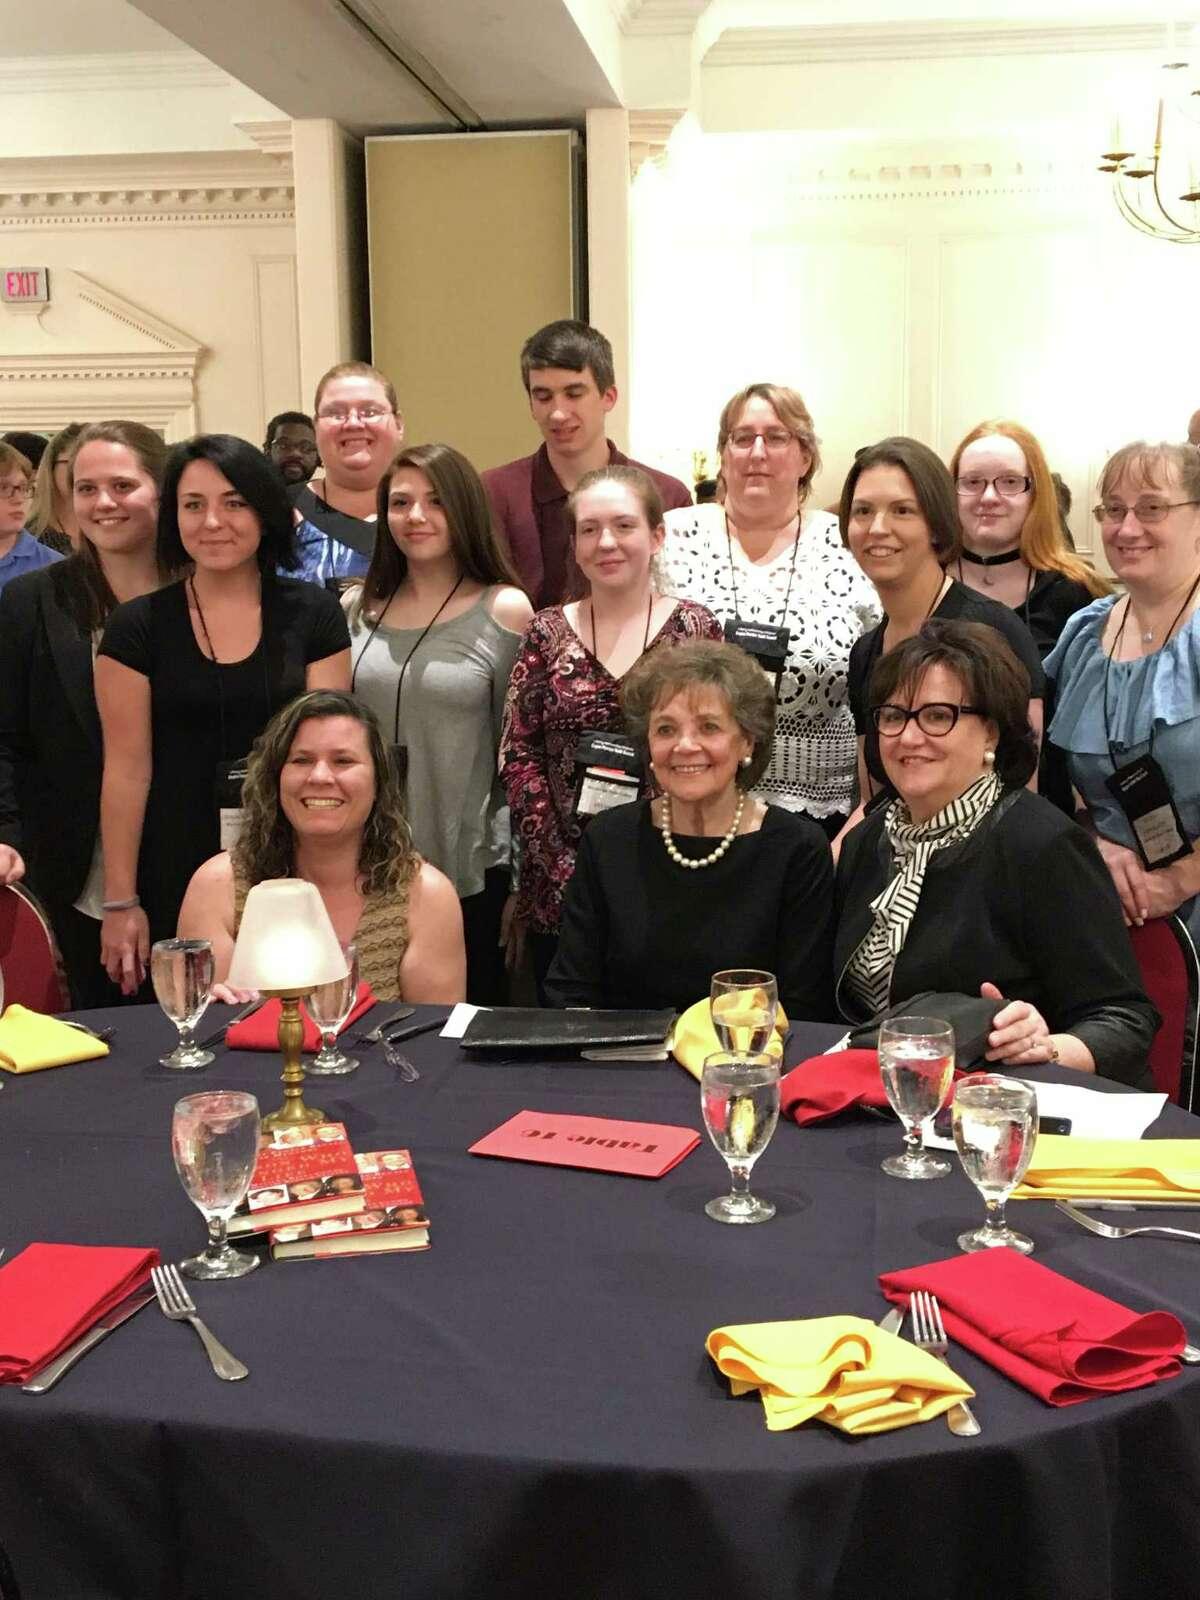 Matilda Raffa Cuomo received the Liberty Partnerships Program Lifetime Achievement Award Friday night in Colonie from state Education Commissioner MaryEllen Elia.